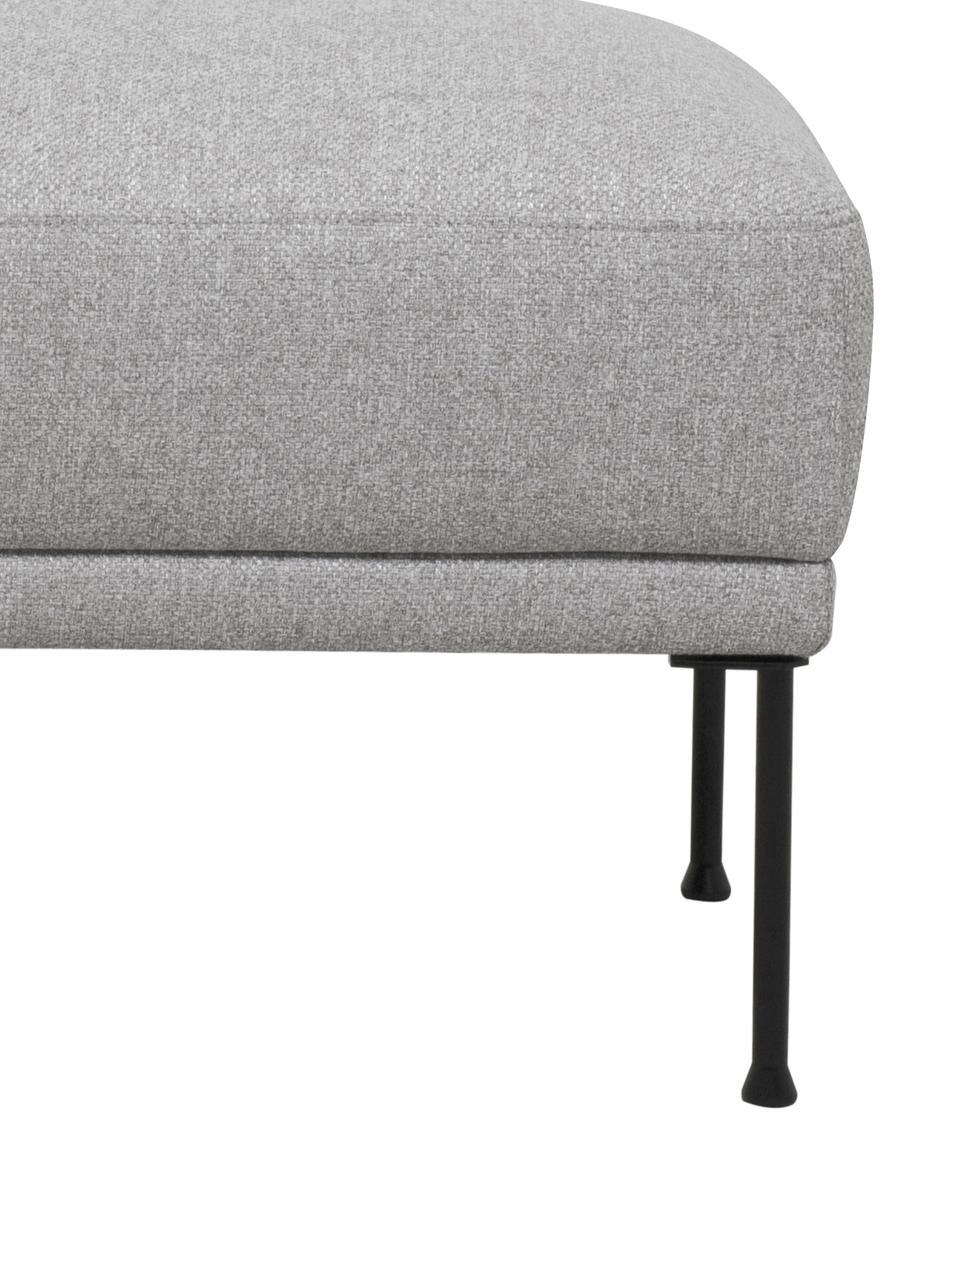 Sofa-Hocker Fluente, Bezug: 80% Polyester, 20% Ramie , Gestell: Massives Kiefernholz, Füße: Metall, pulverbeschichtet, Webstoff Hellgrau, 62 x 46 cm